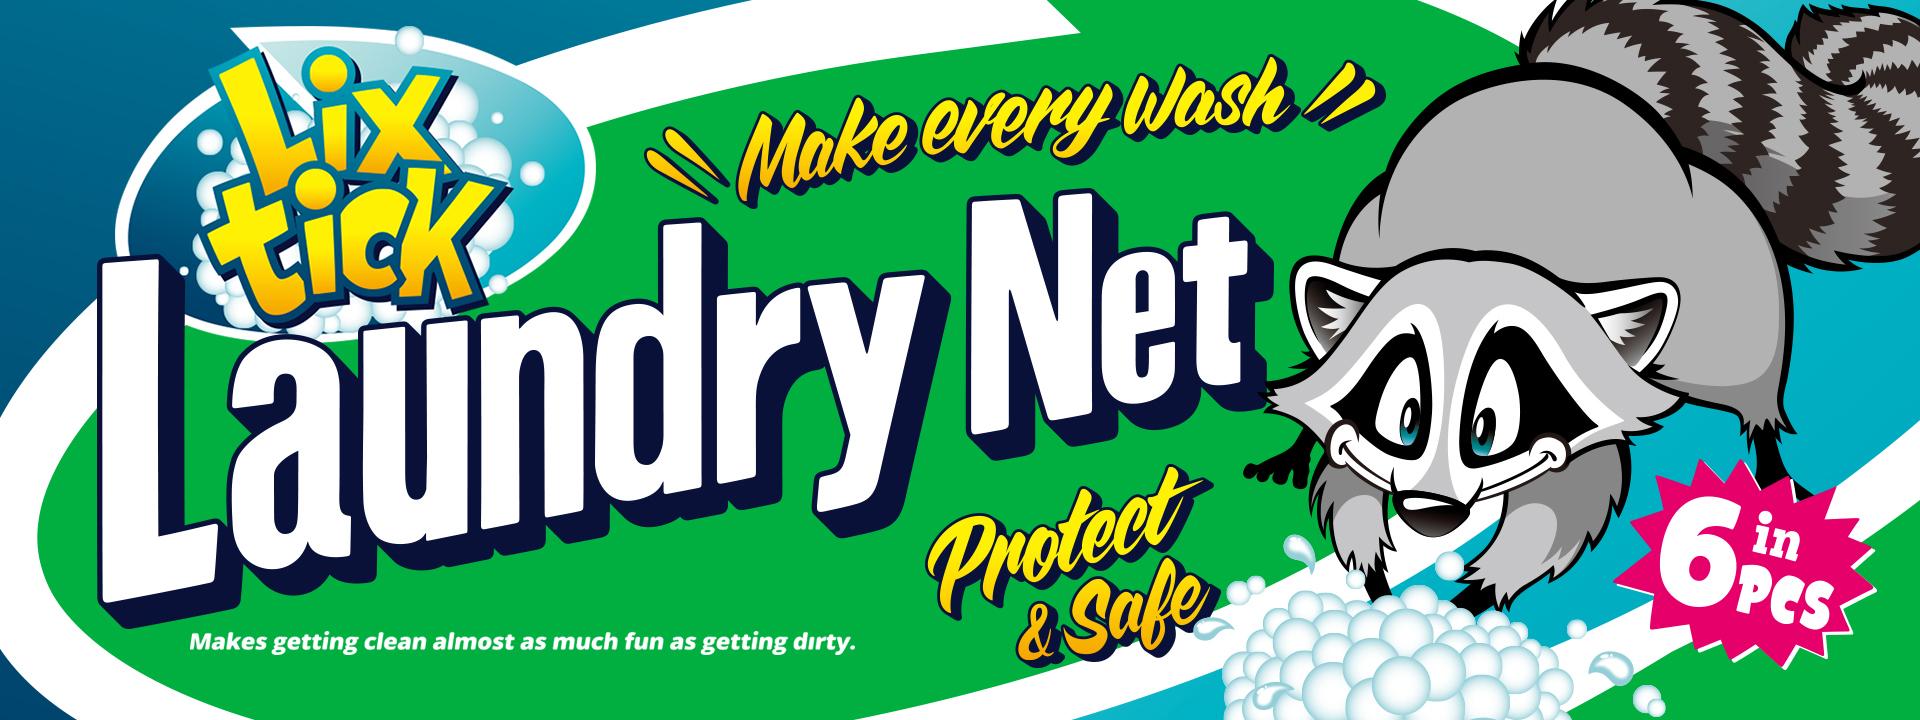 LIXTICK Laundry Net